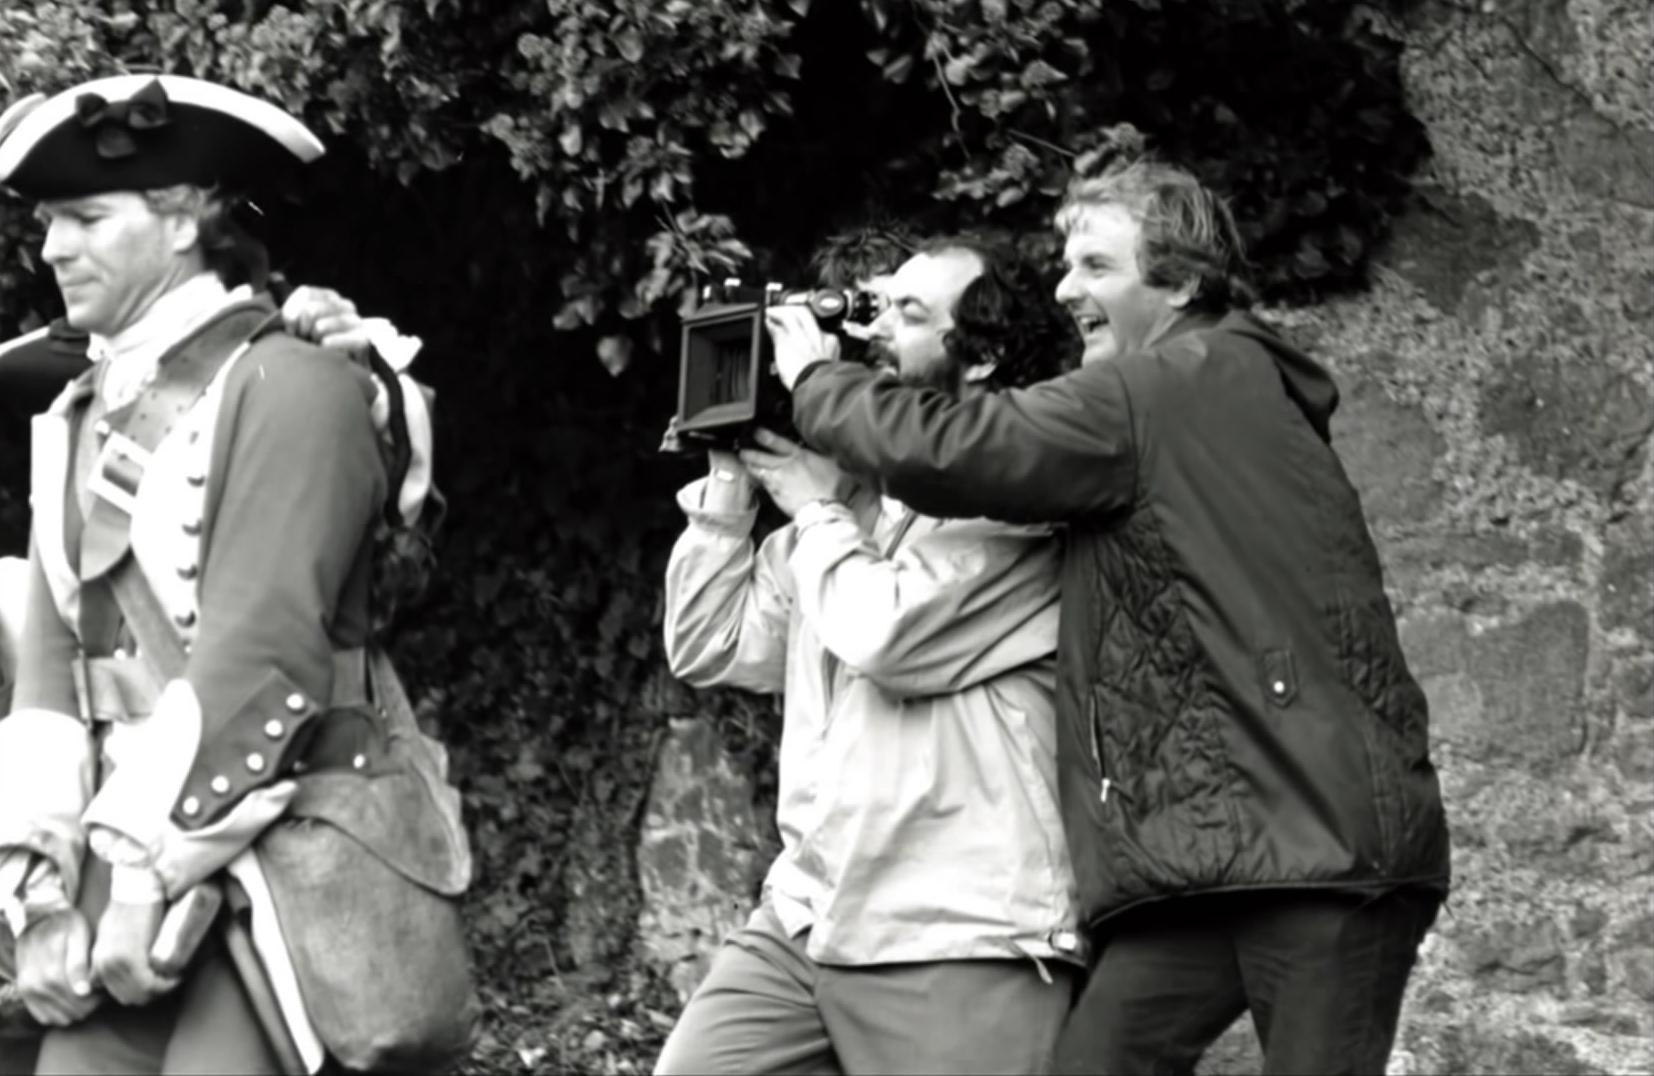 barry-lyndon-filming-18.jpg